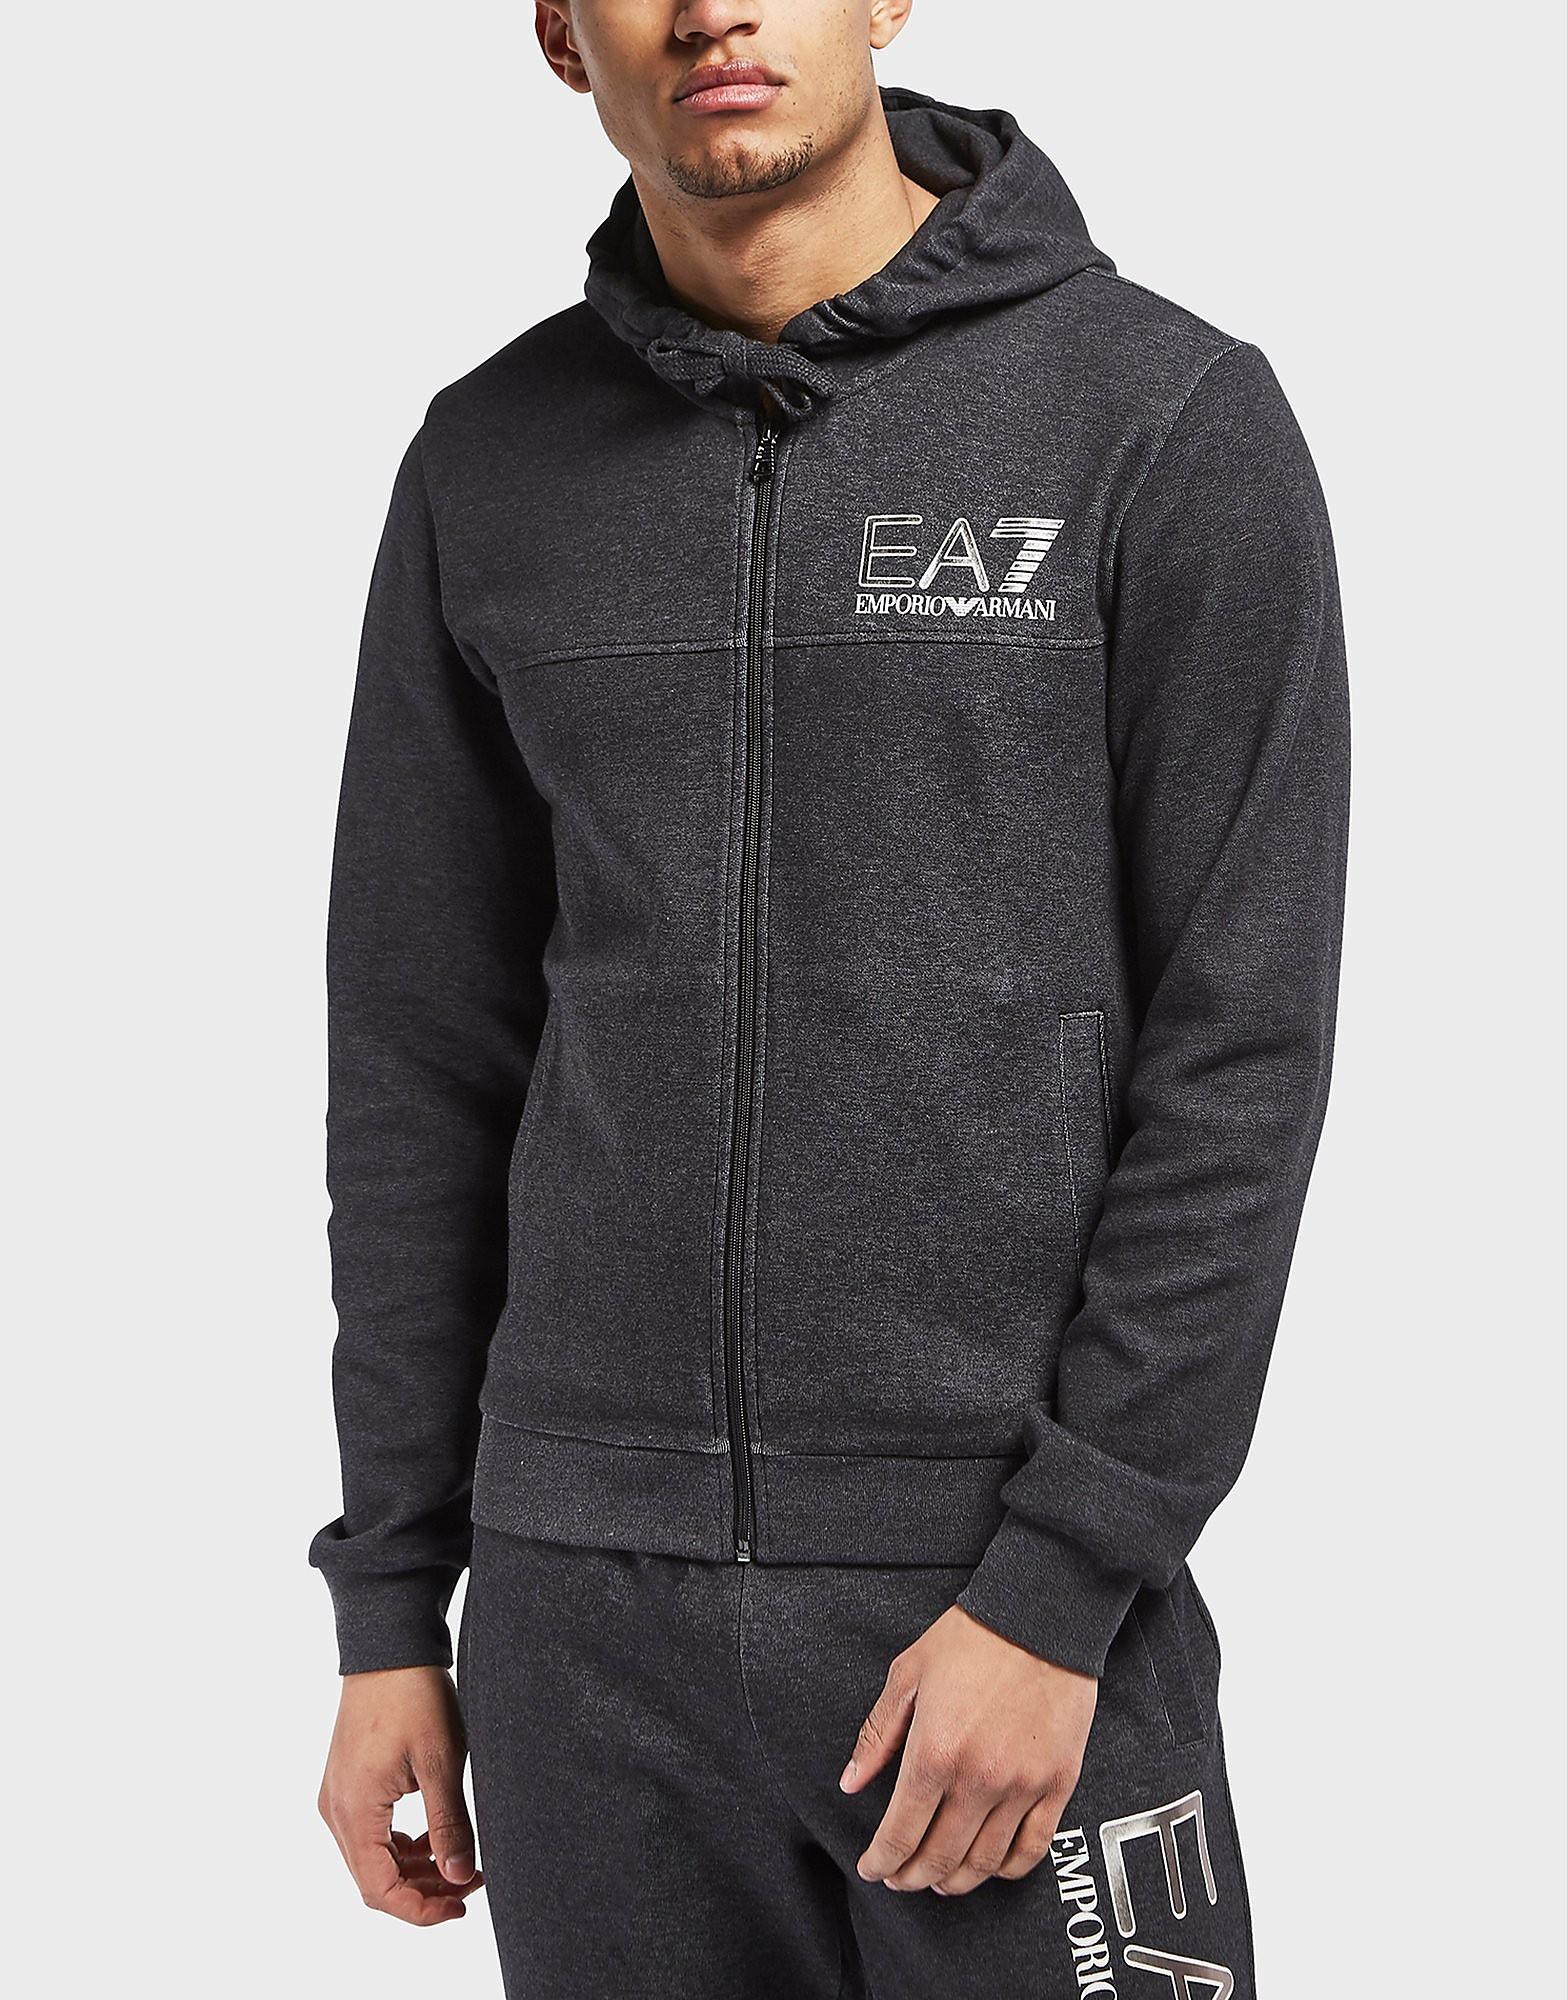 Emporio Armani EA7 Visibility Marl Full Zip Hoodie - Exclusive